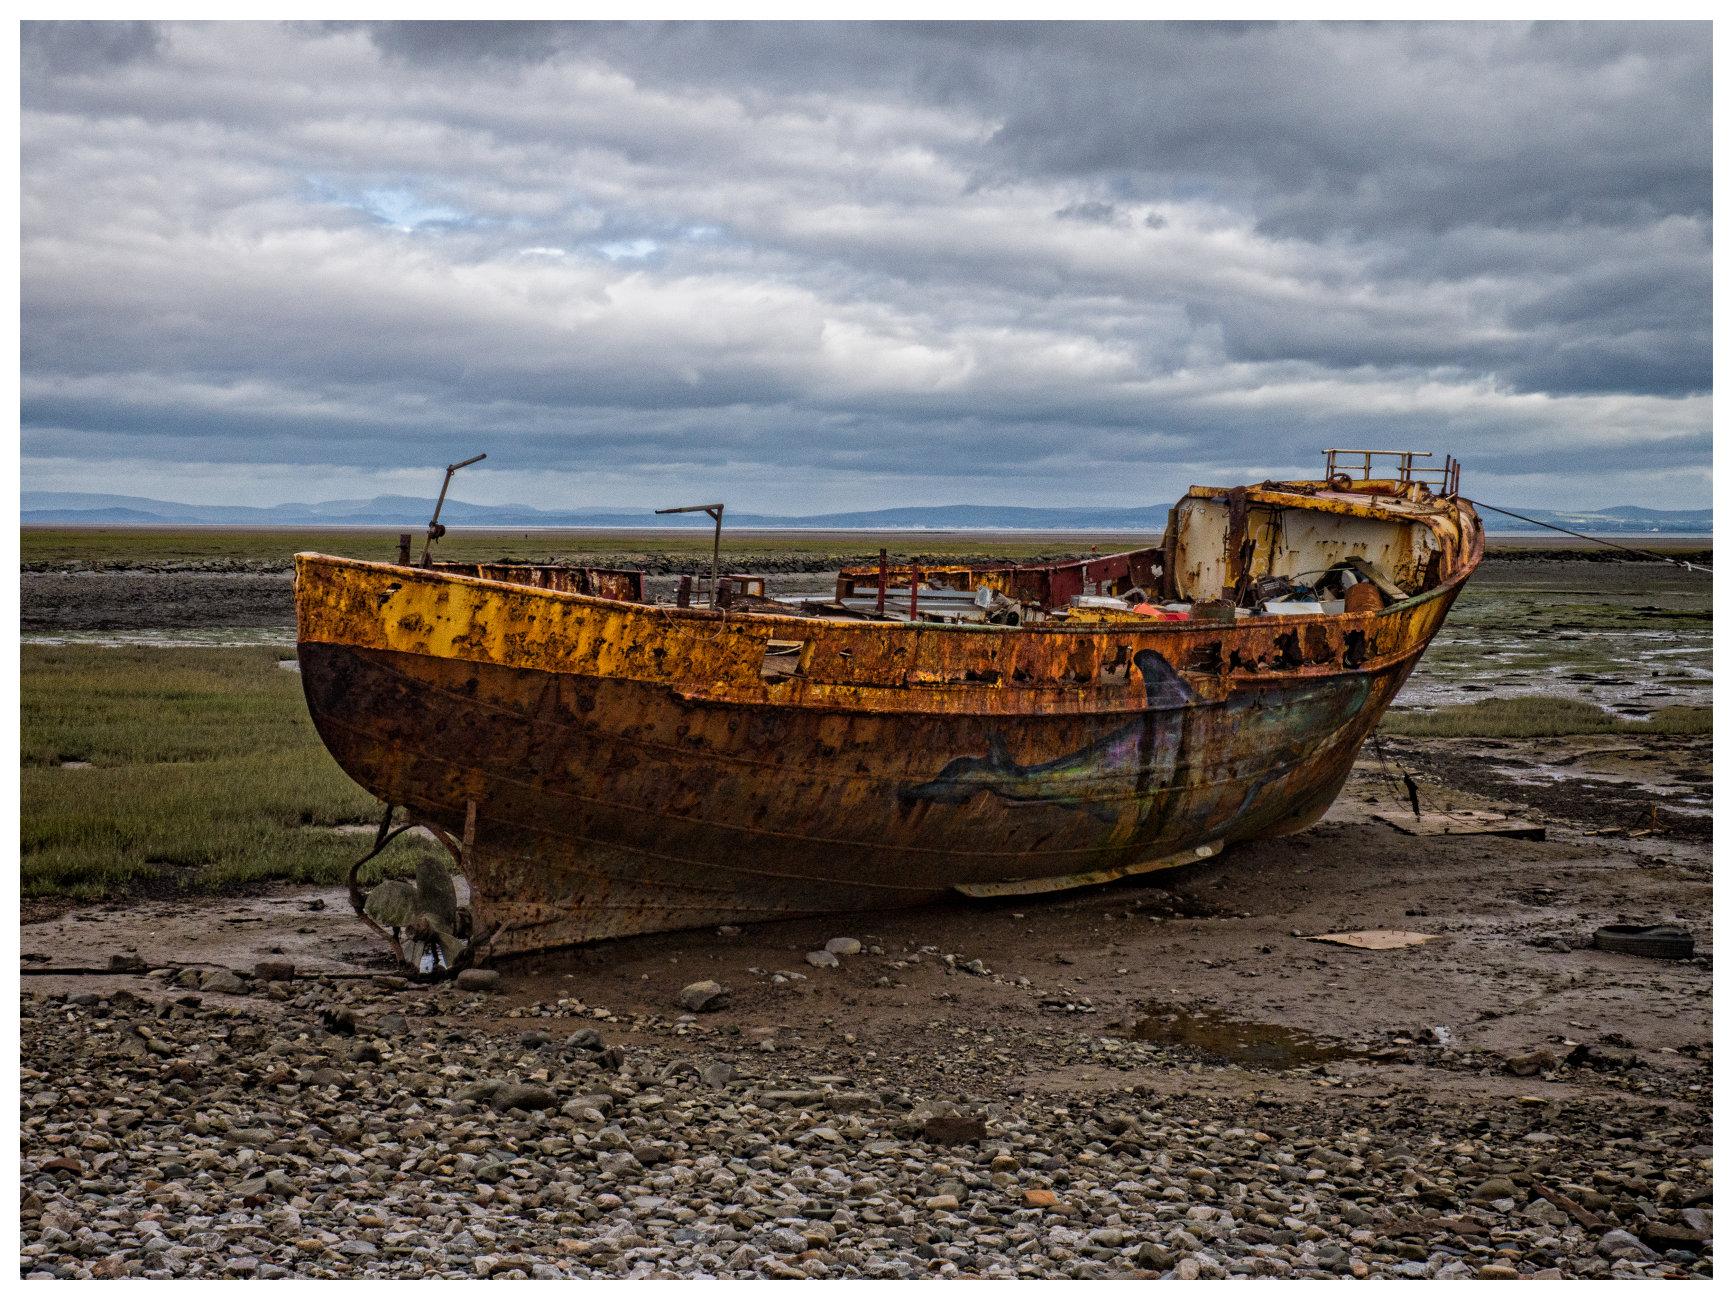 Roa Island Wreck